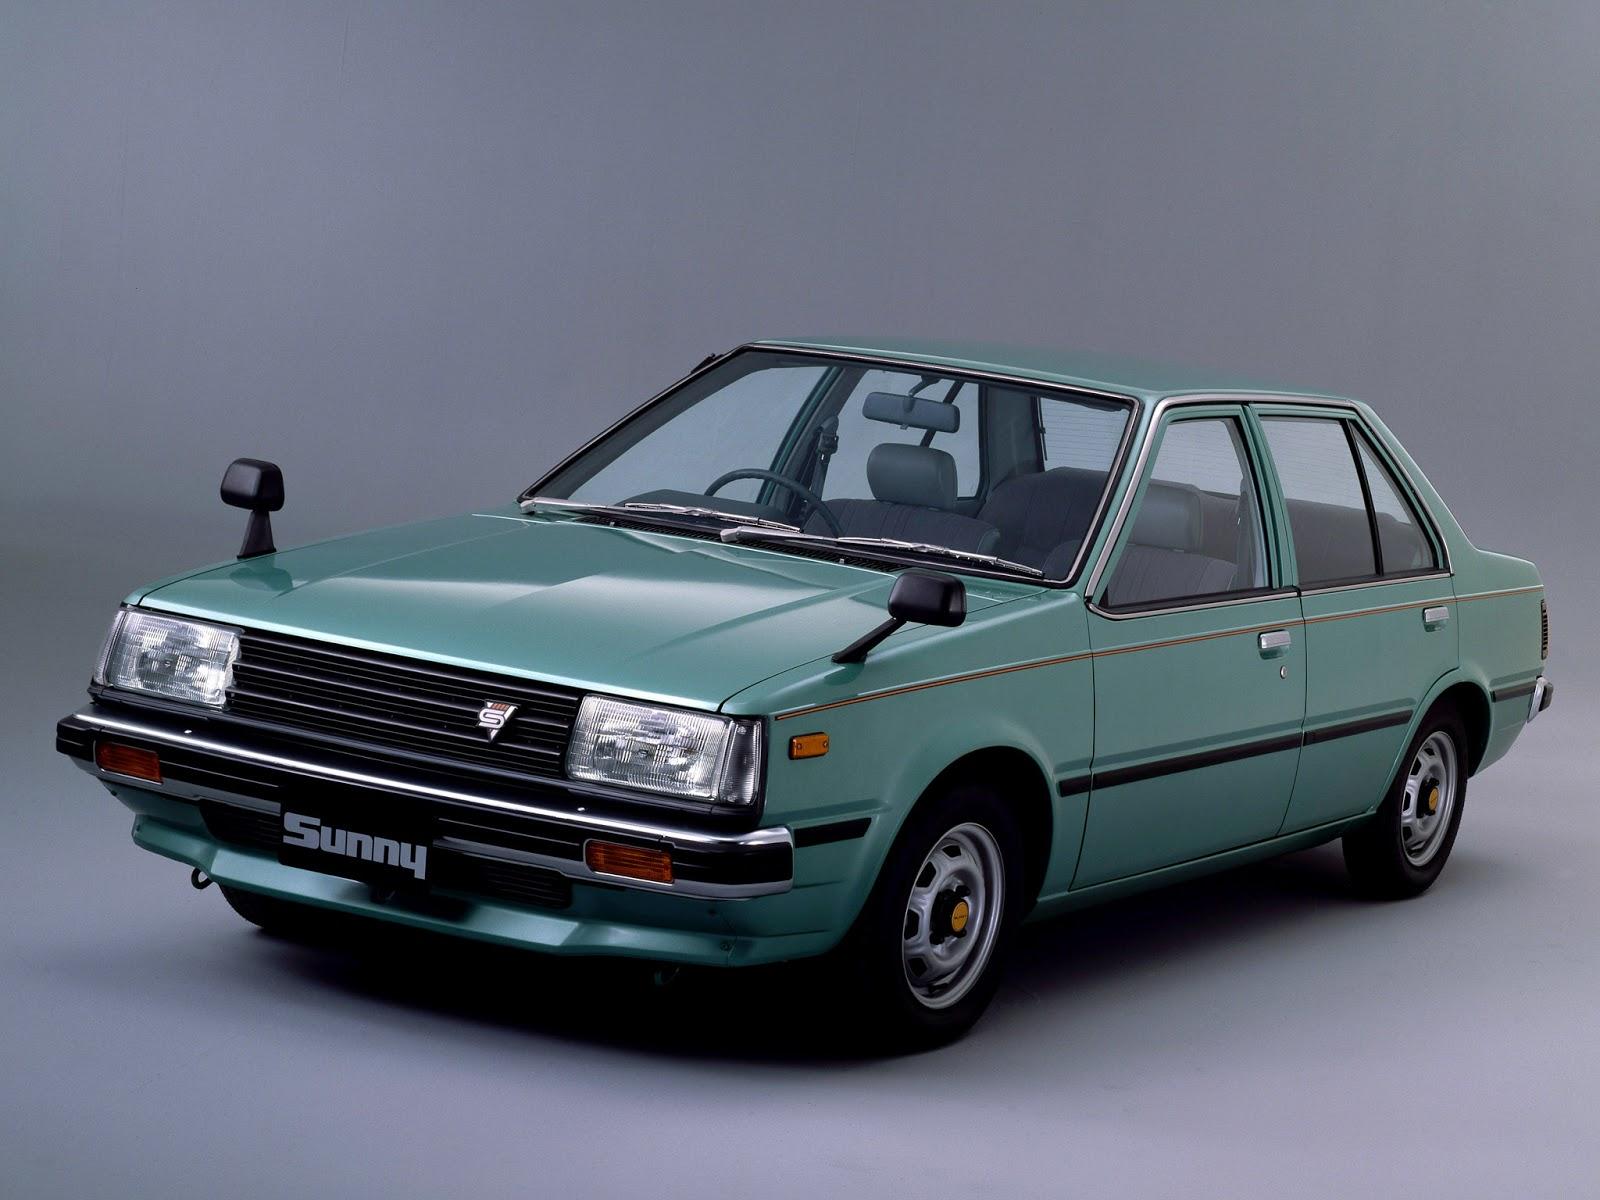 Speed Machines Classic 1981 Nissan Sunny B11 Sedan 17